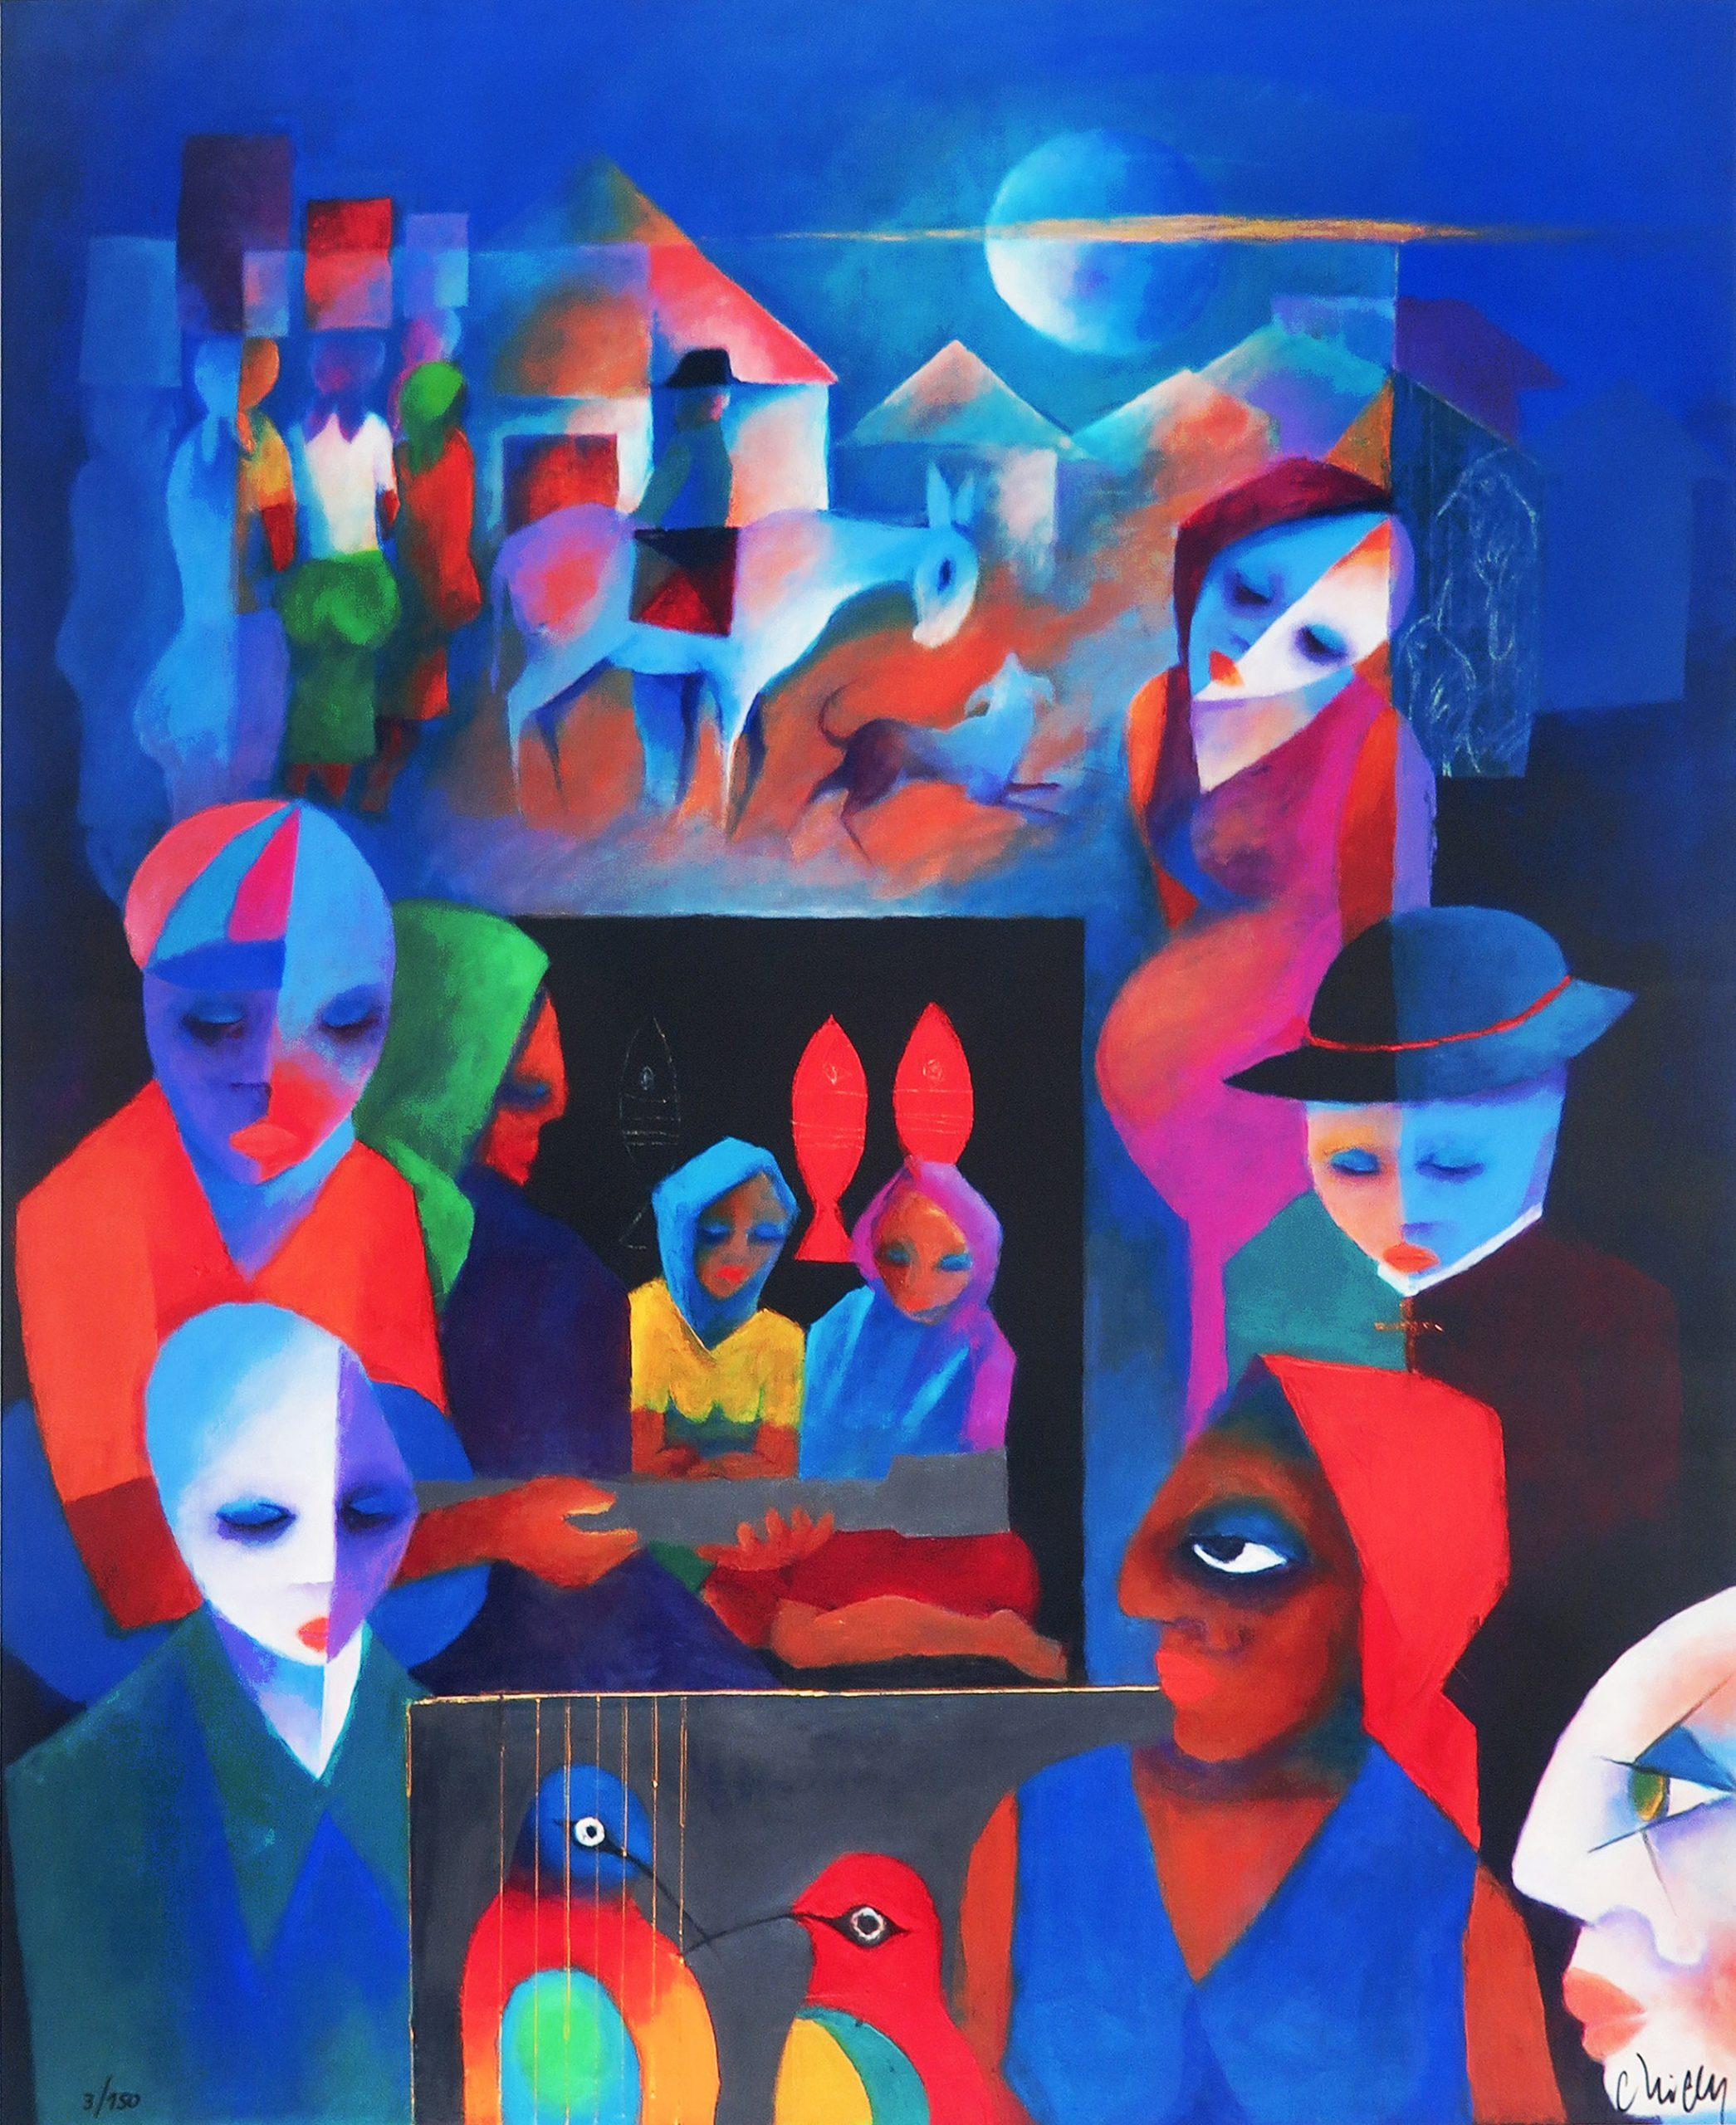 Sem título, giclée fine art sobre tela, 100 x 80 cm